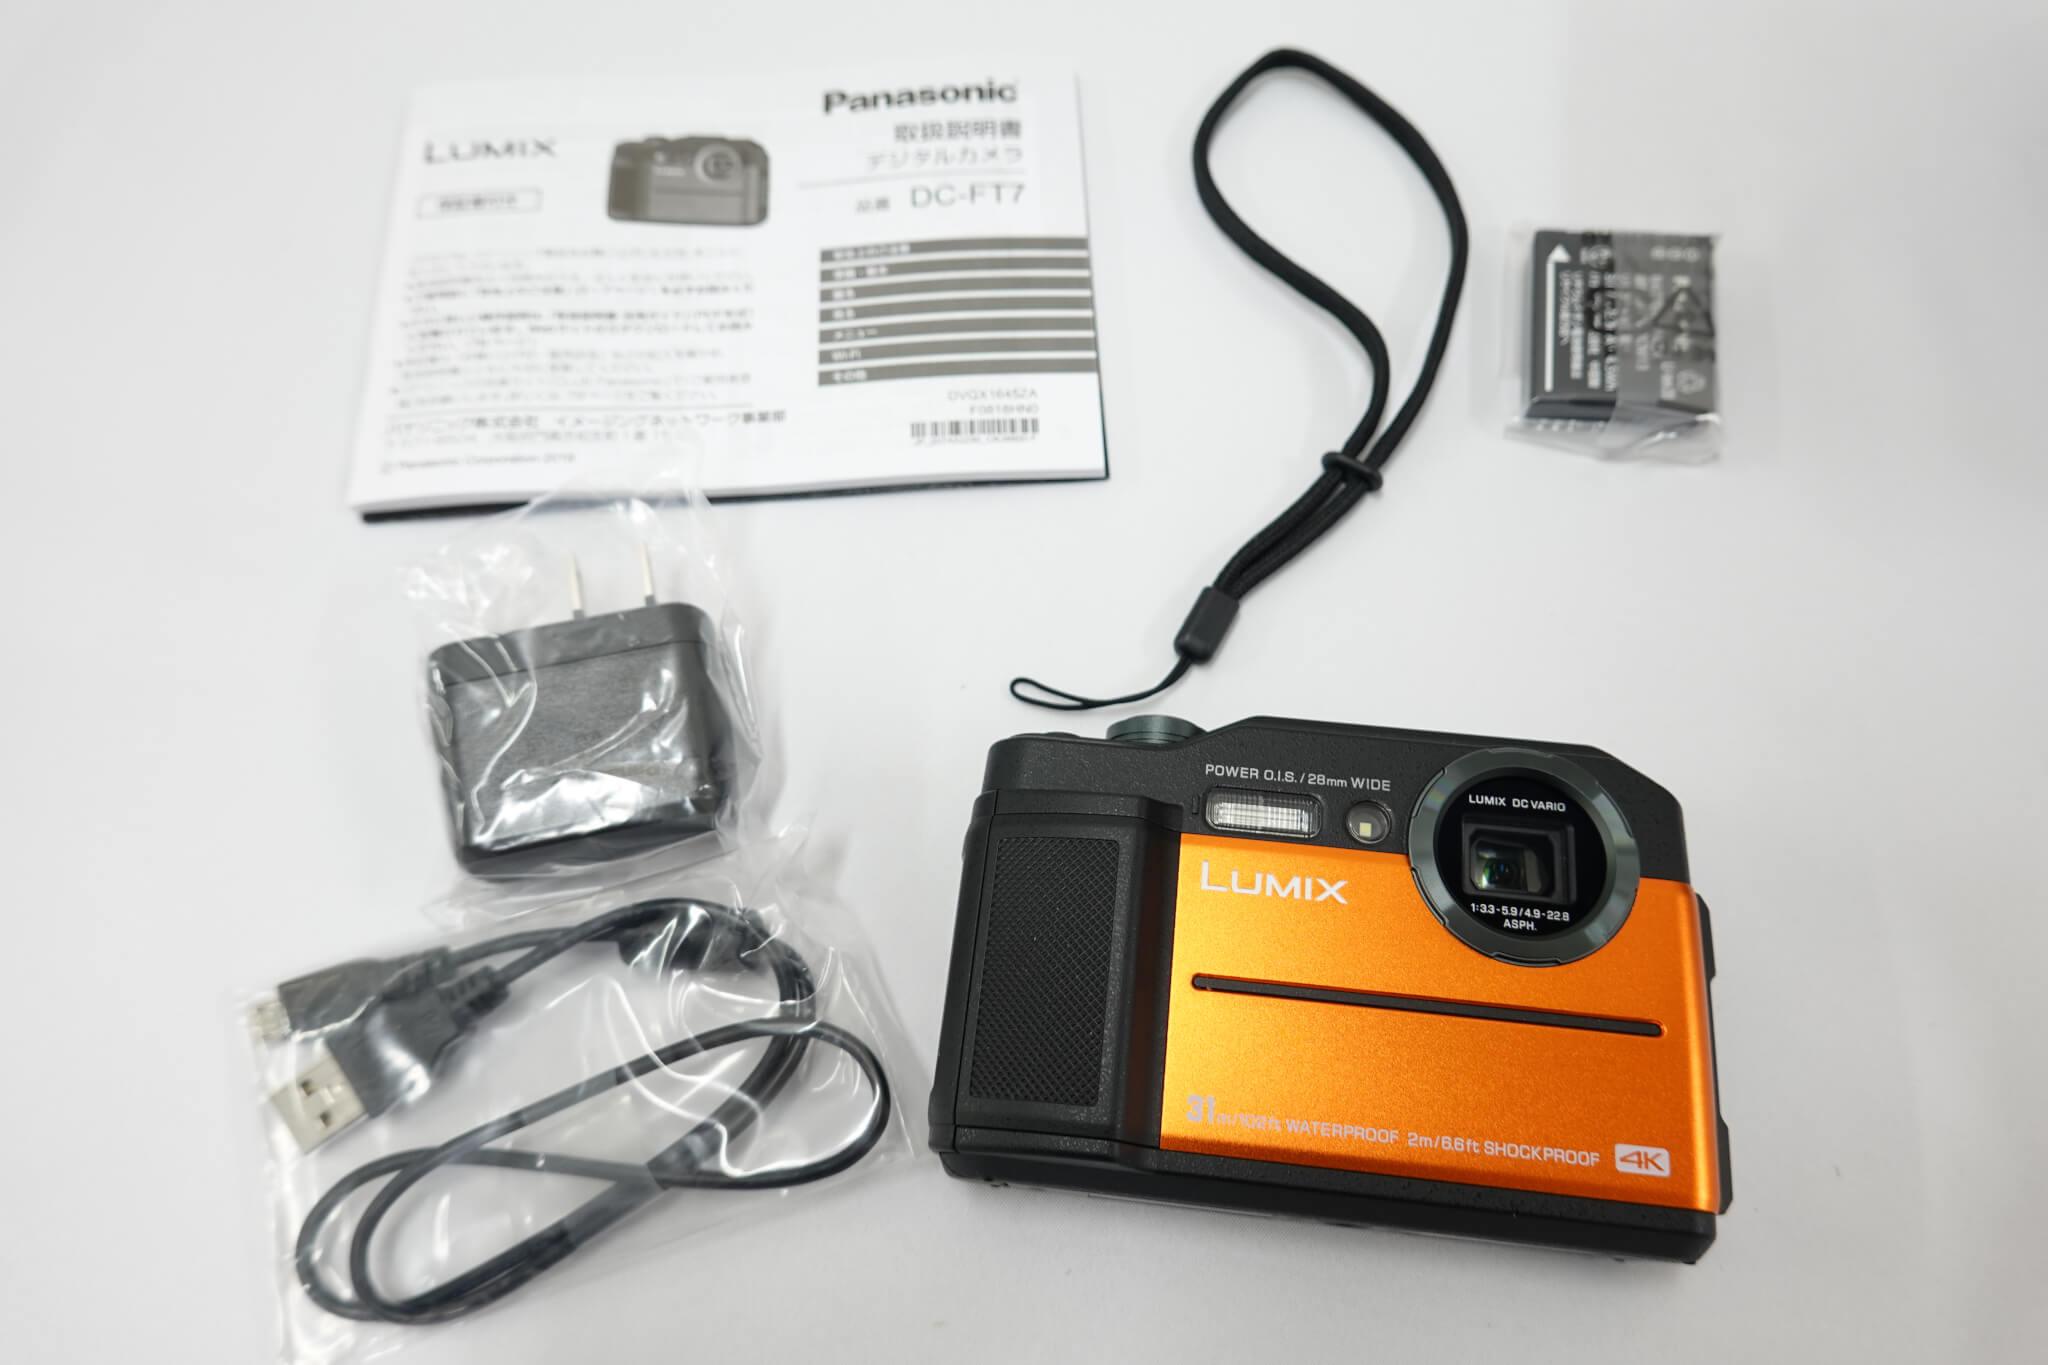 LUMIX DC-FT7 カメラ本体と付属品一覧